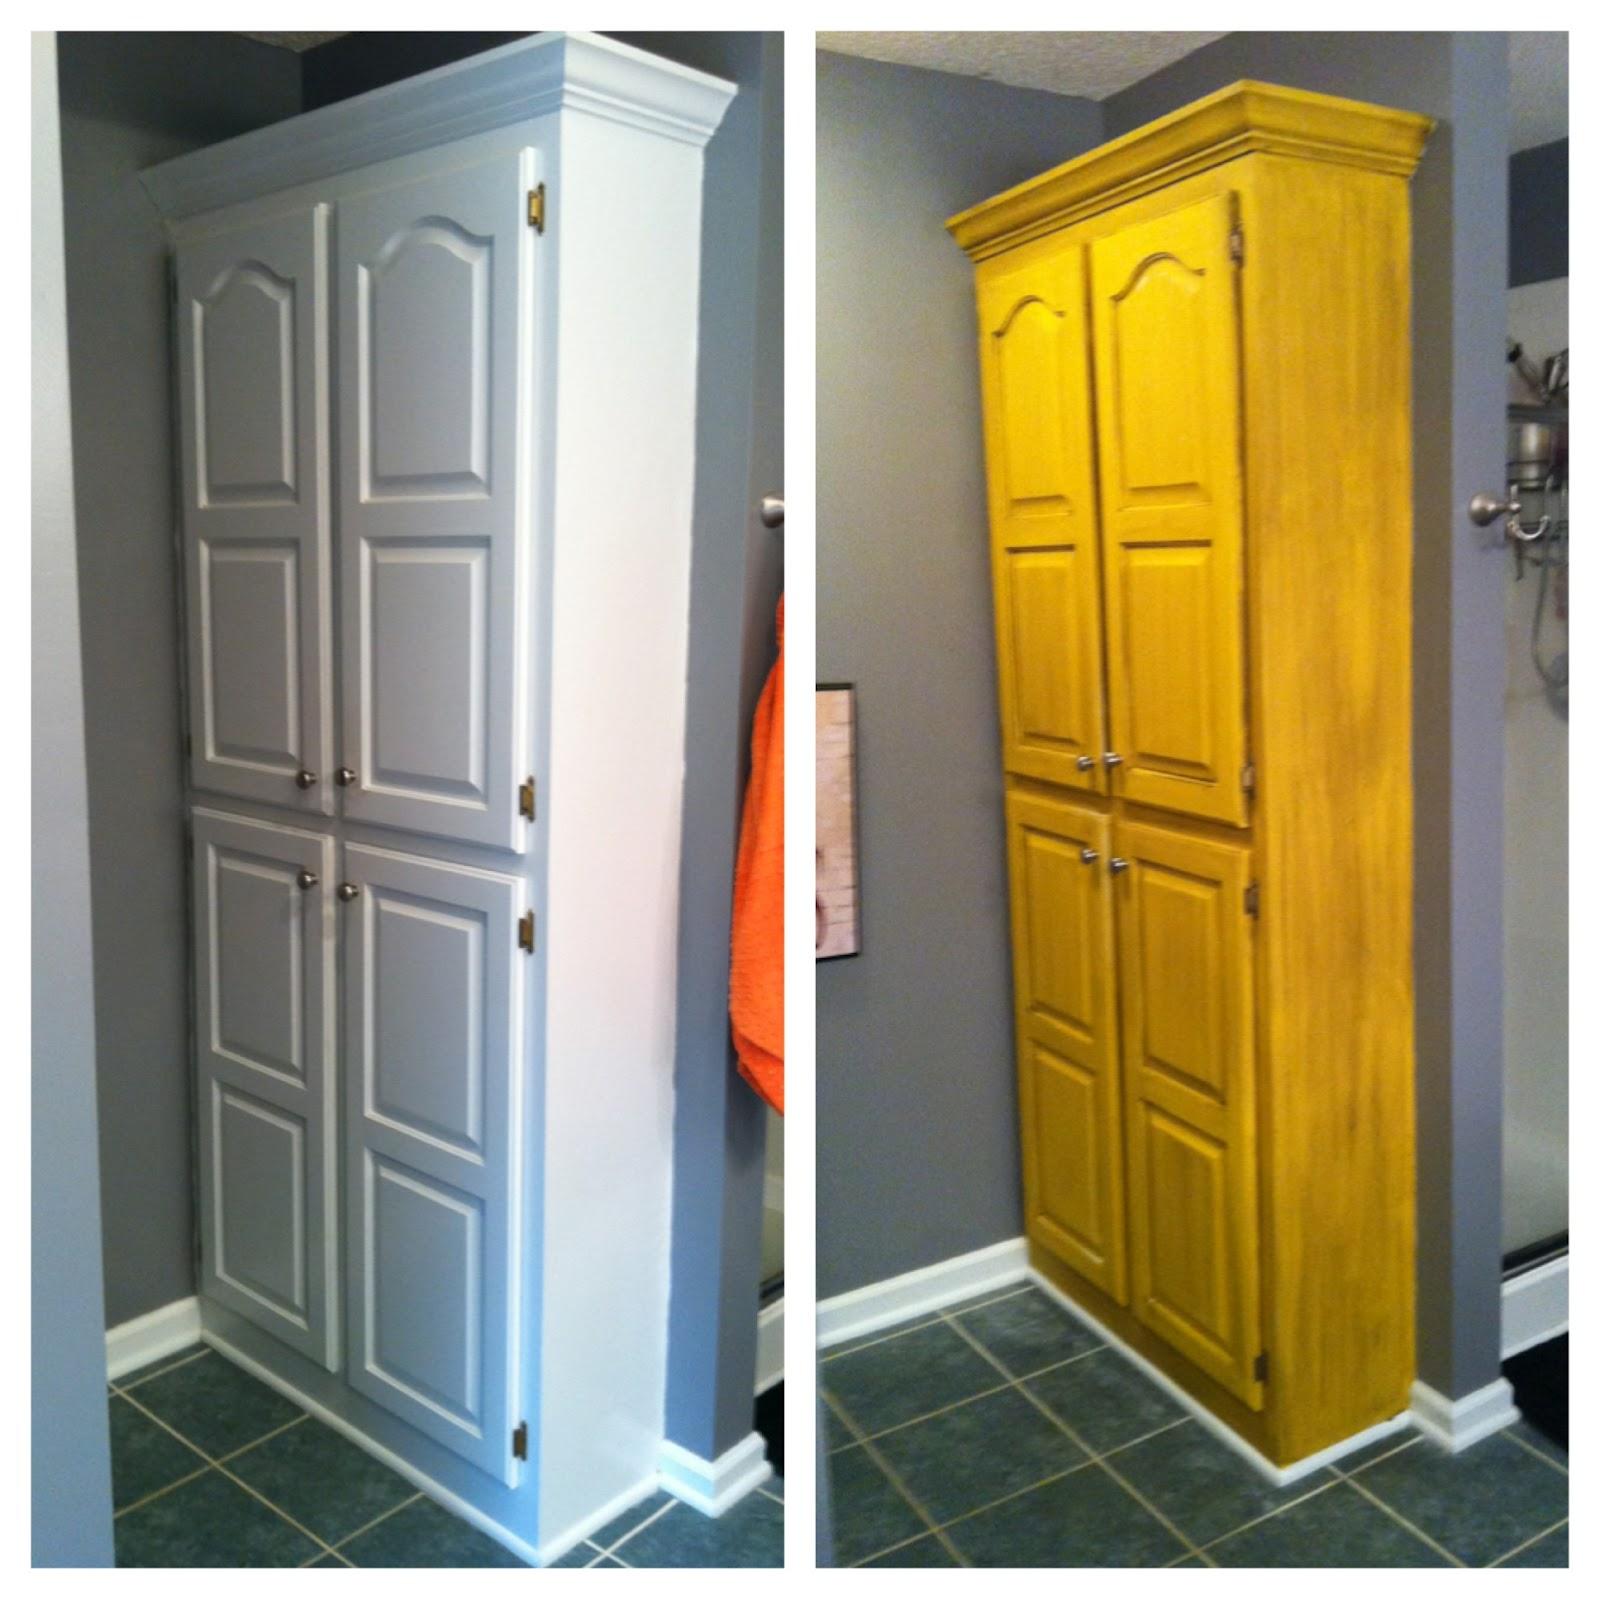 Bathroom Cabinets Little Rock Ar: My Life As Mrs. McMurry: A Little Weekend DIY.... Bathroom